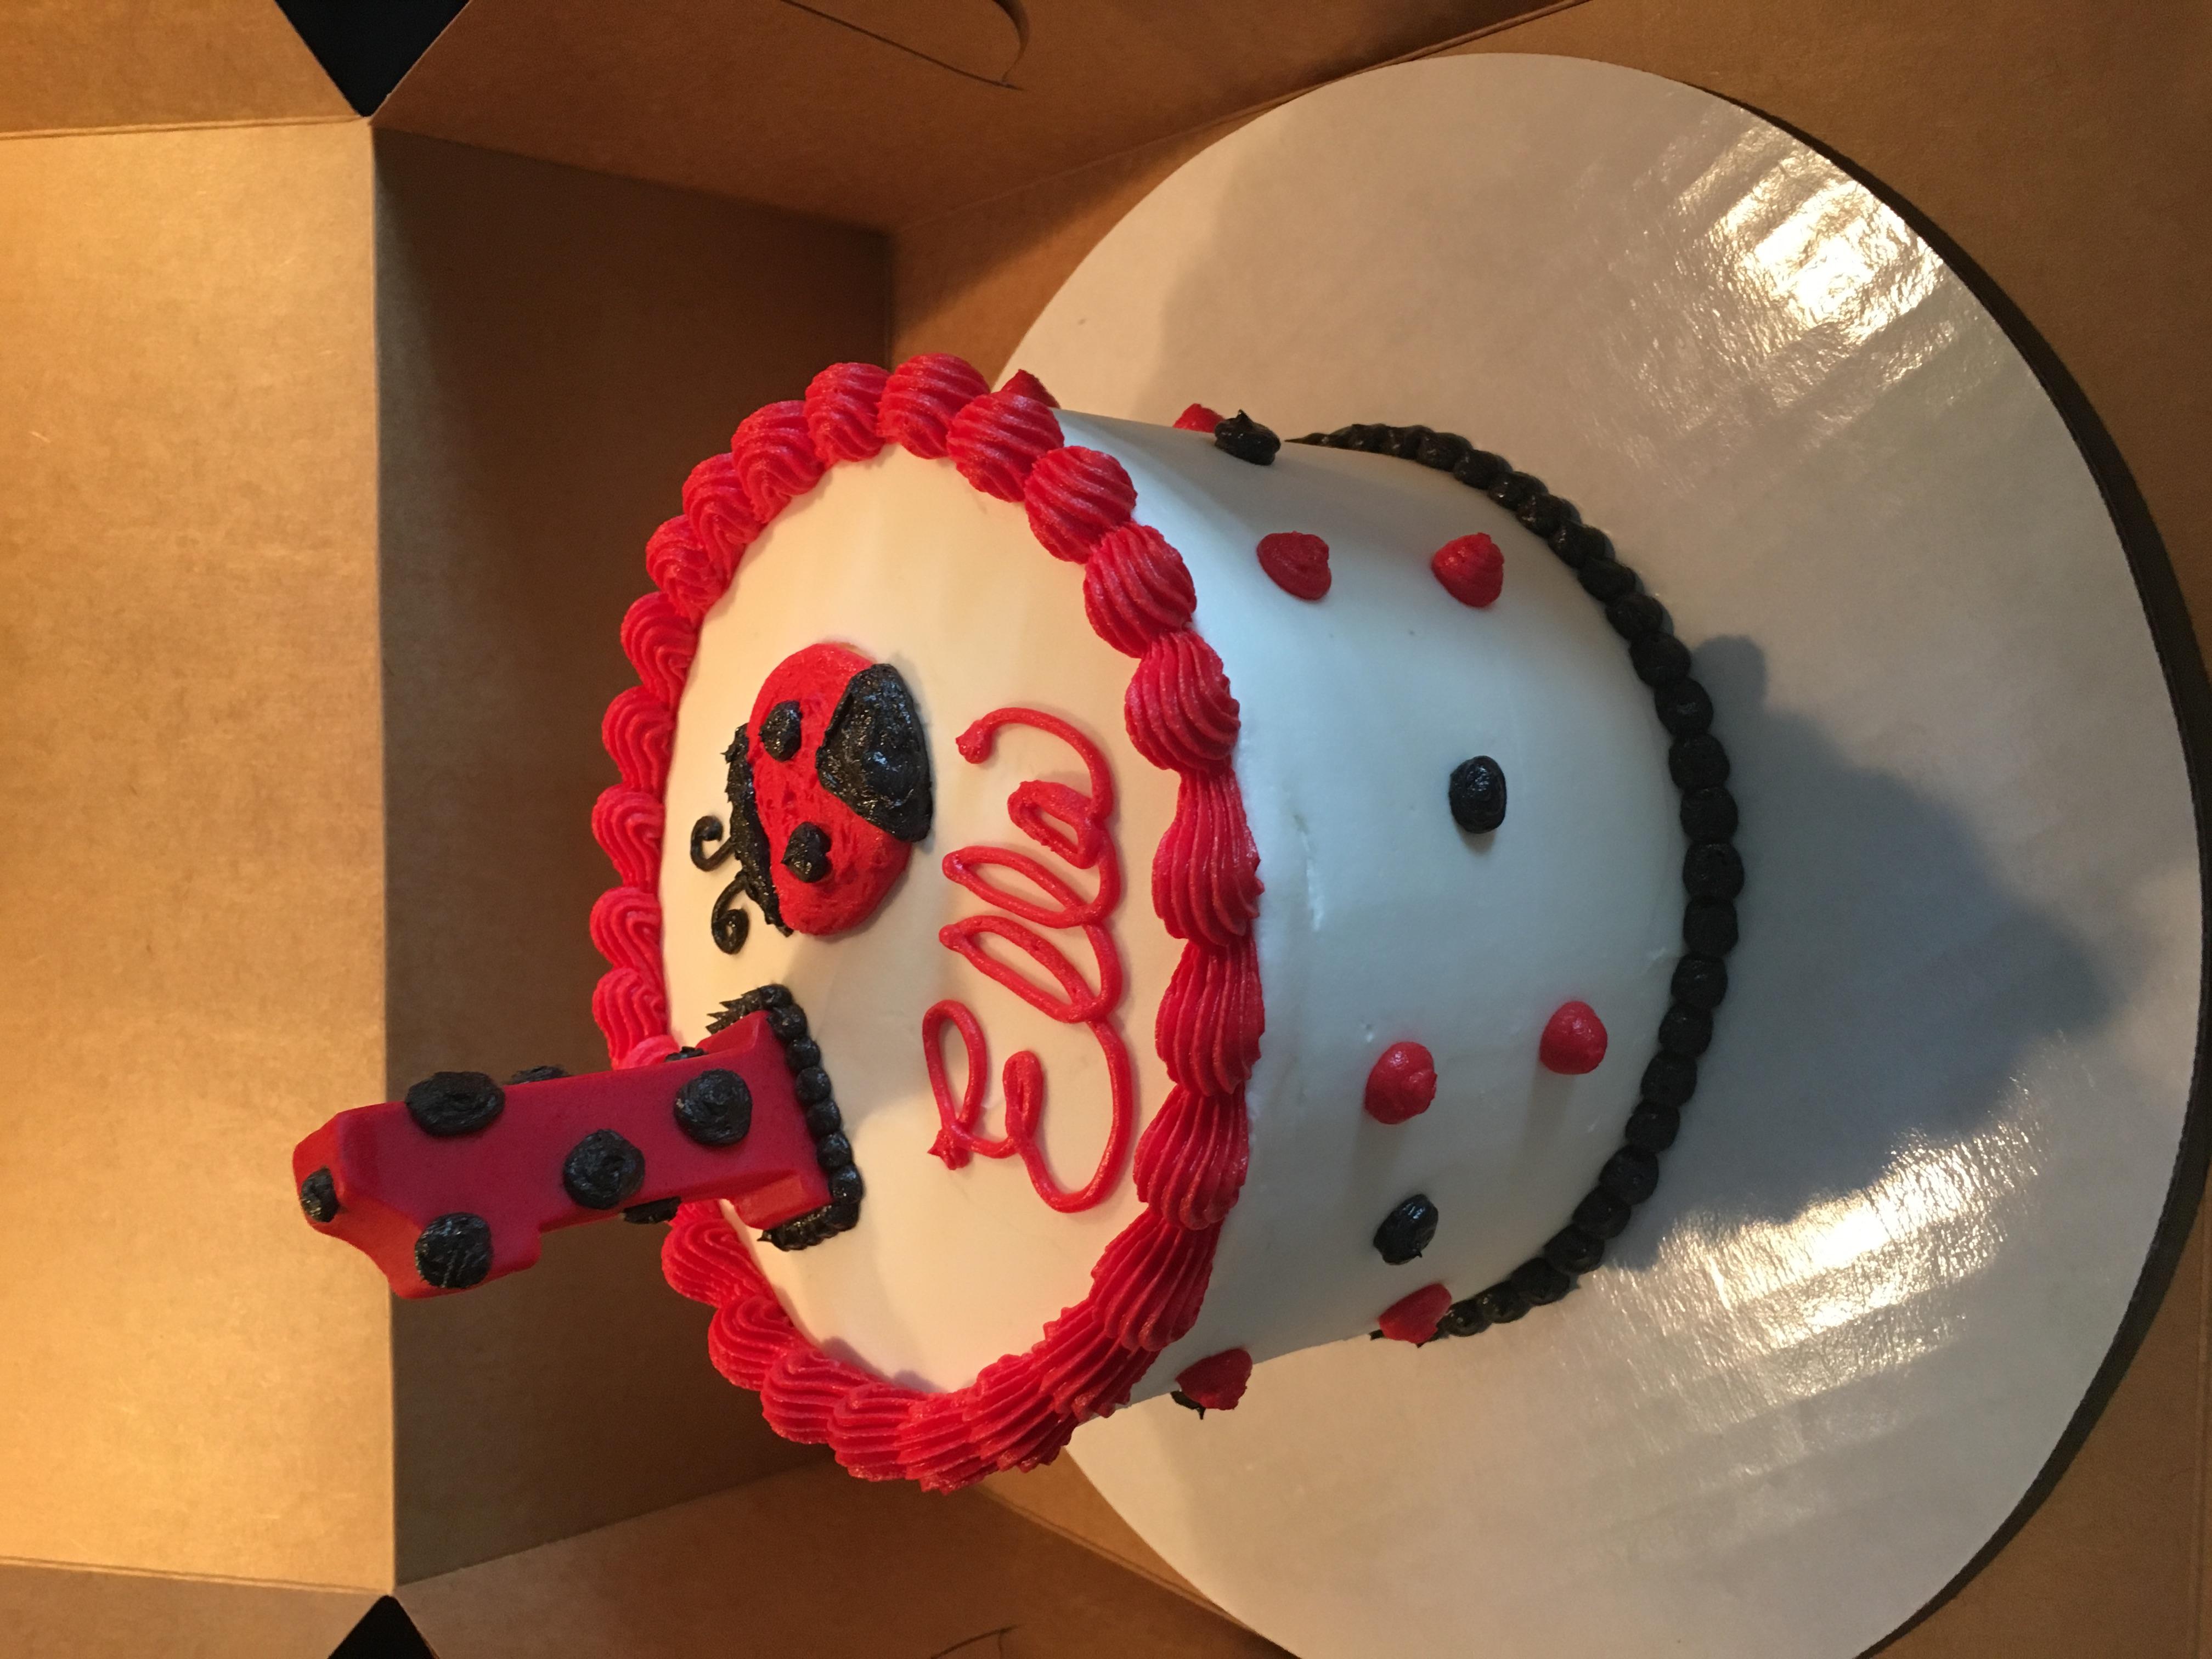 Ladybug cake with 1